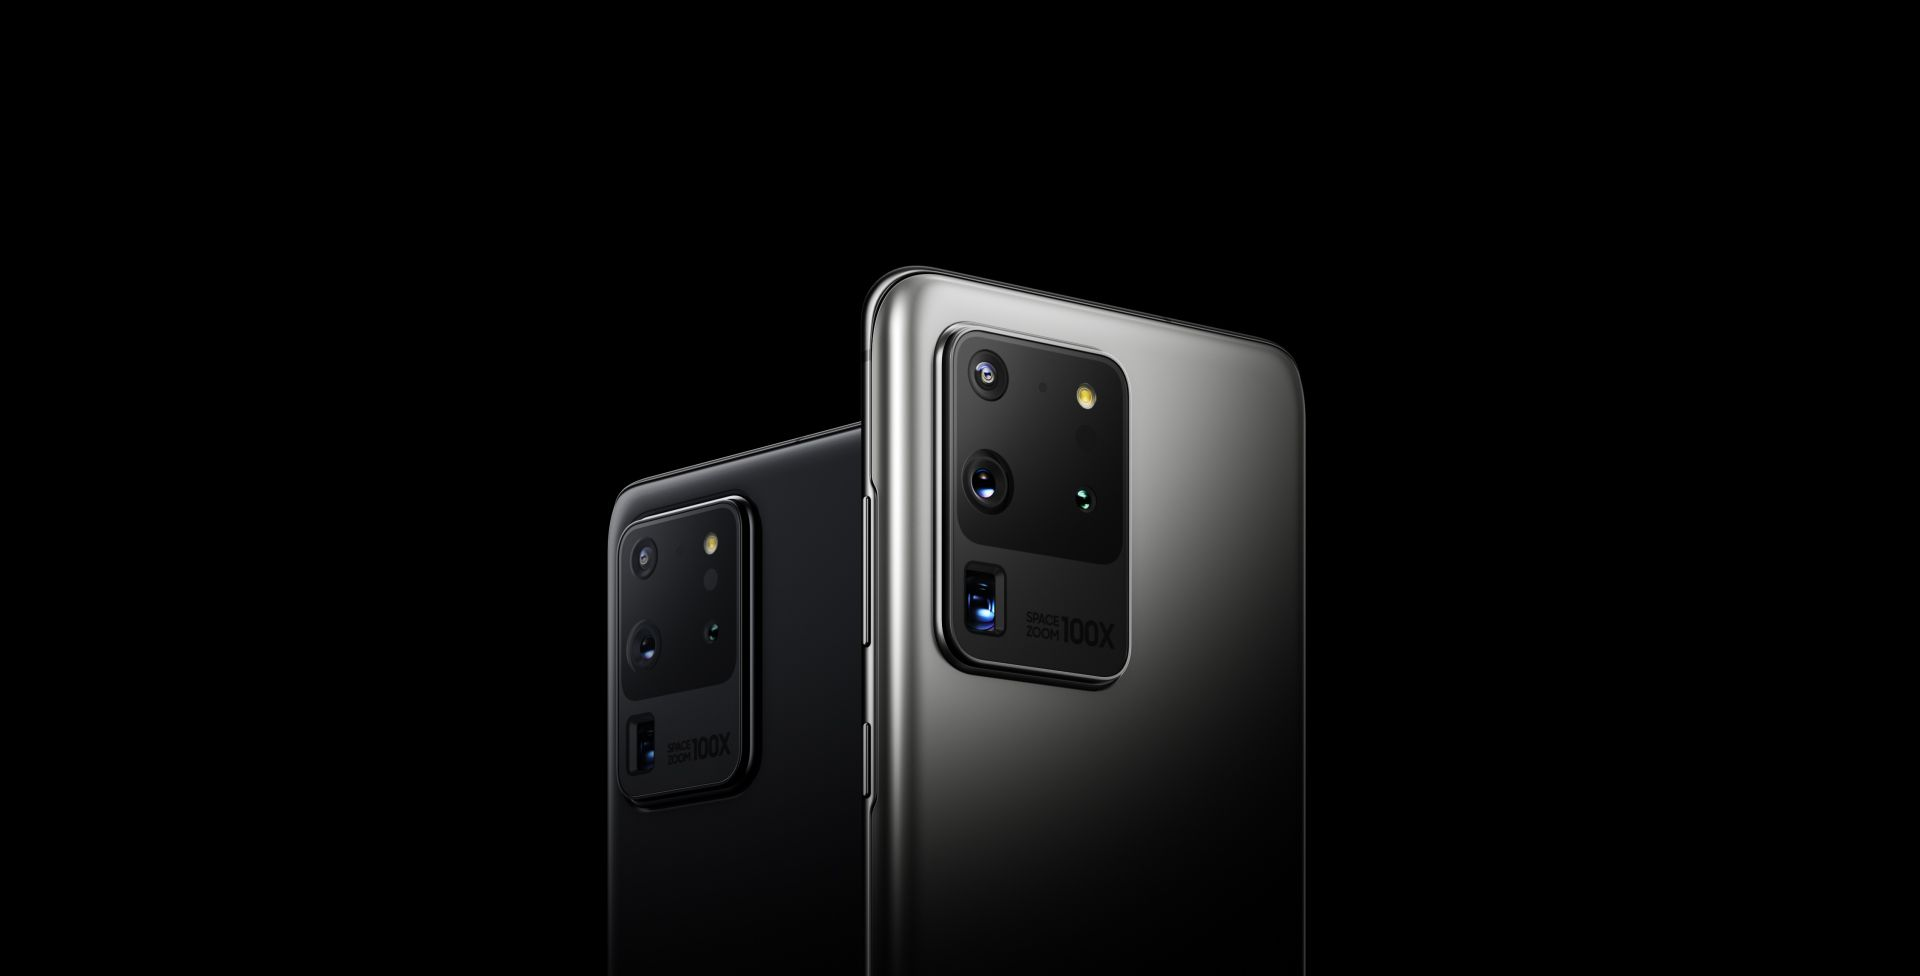 Meizu 16s pro - snapdragon 855 plus и тройная камера за 380 долларов - the roco